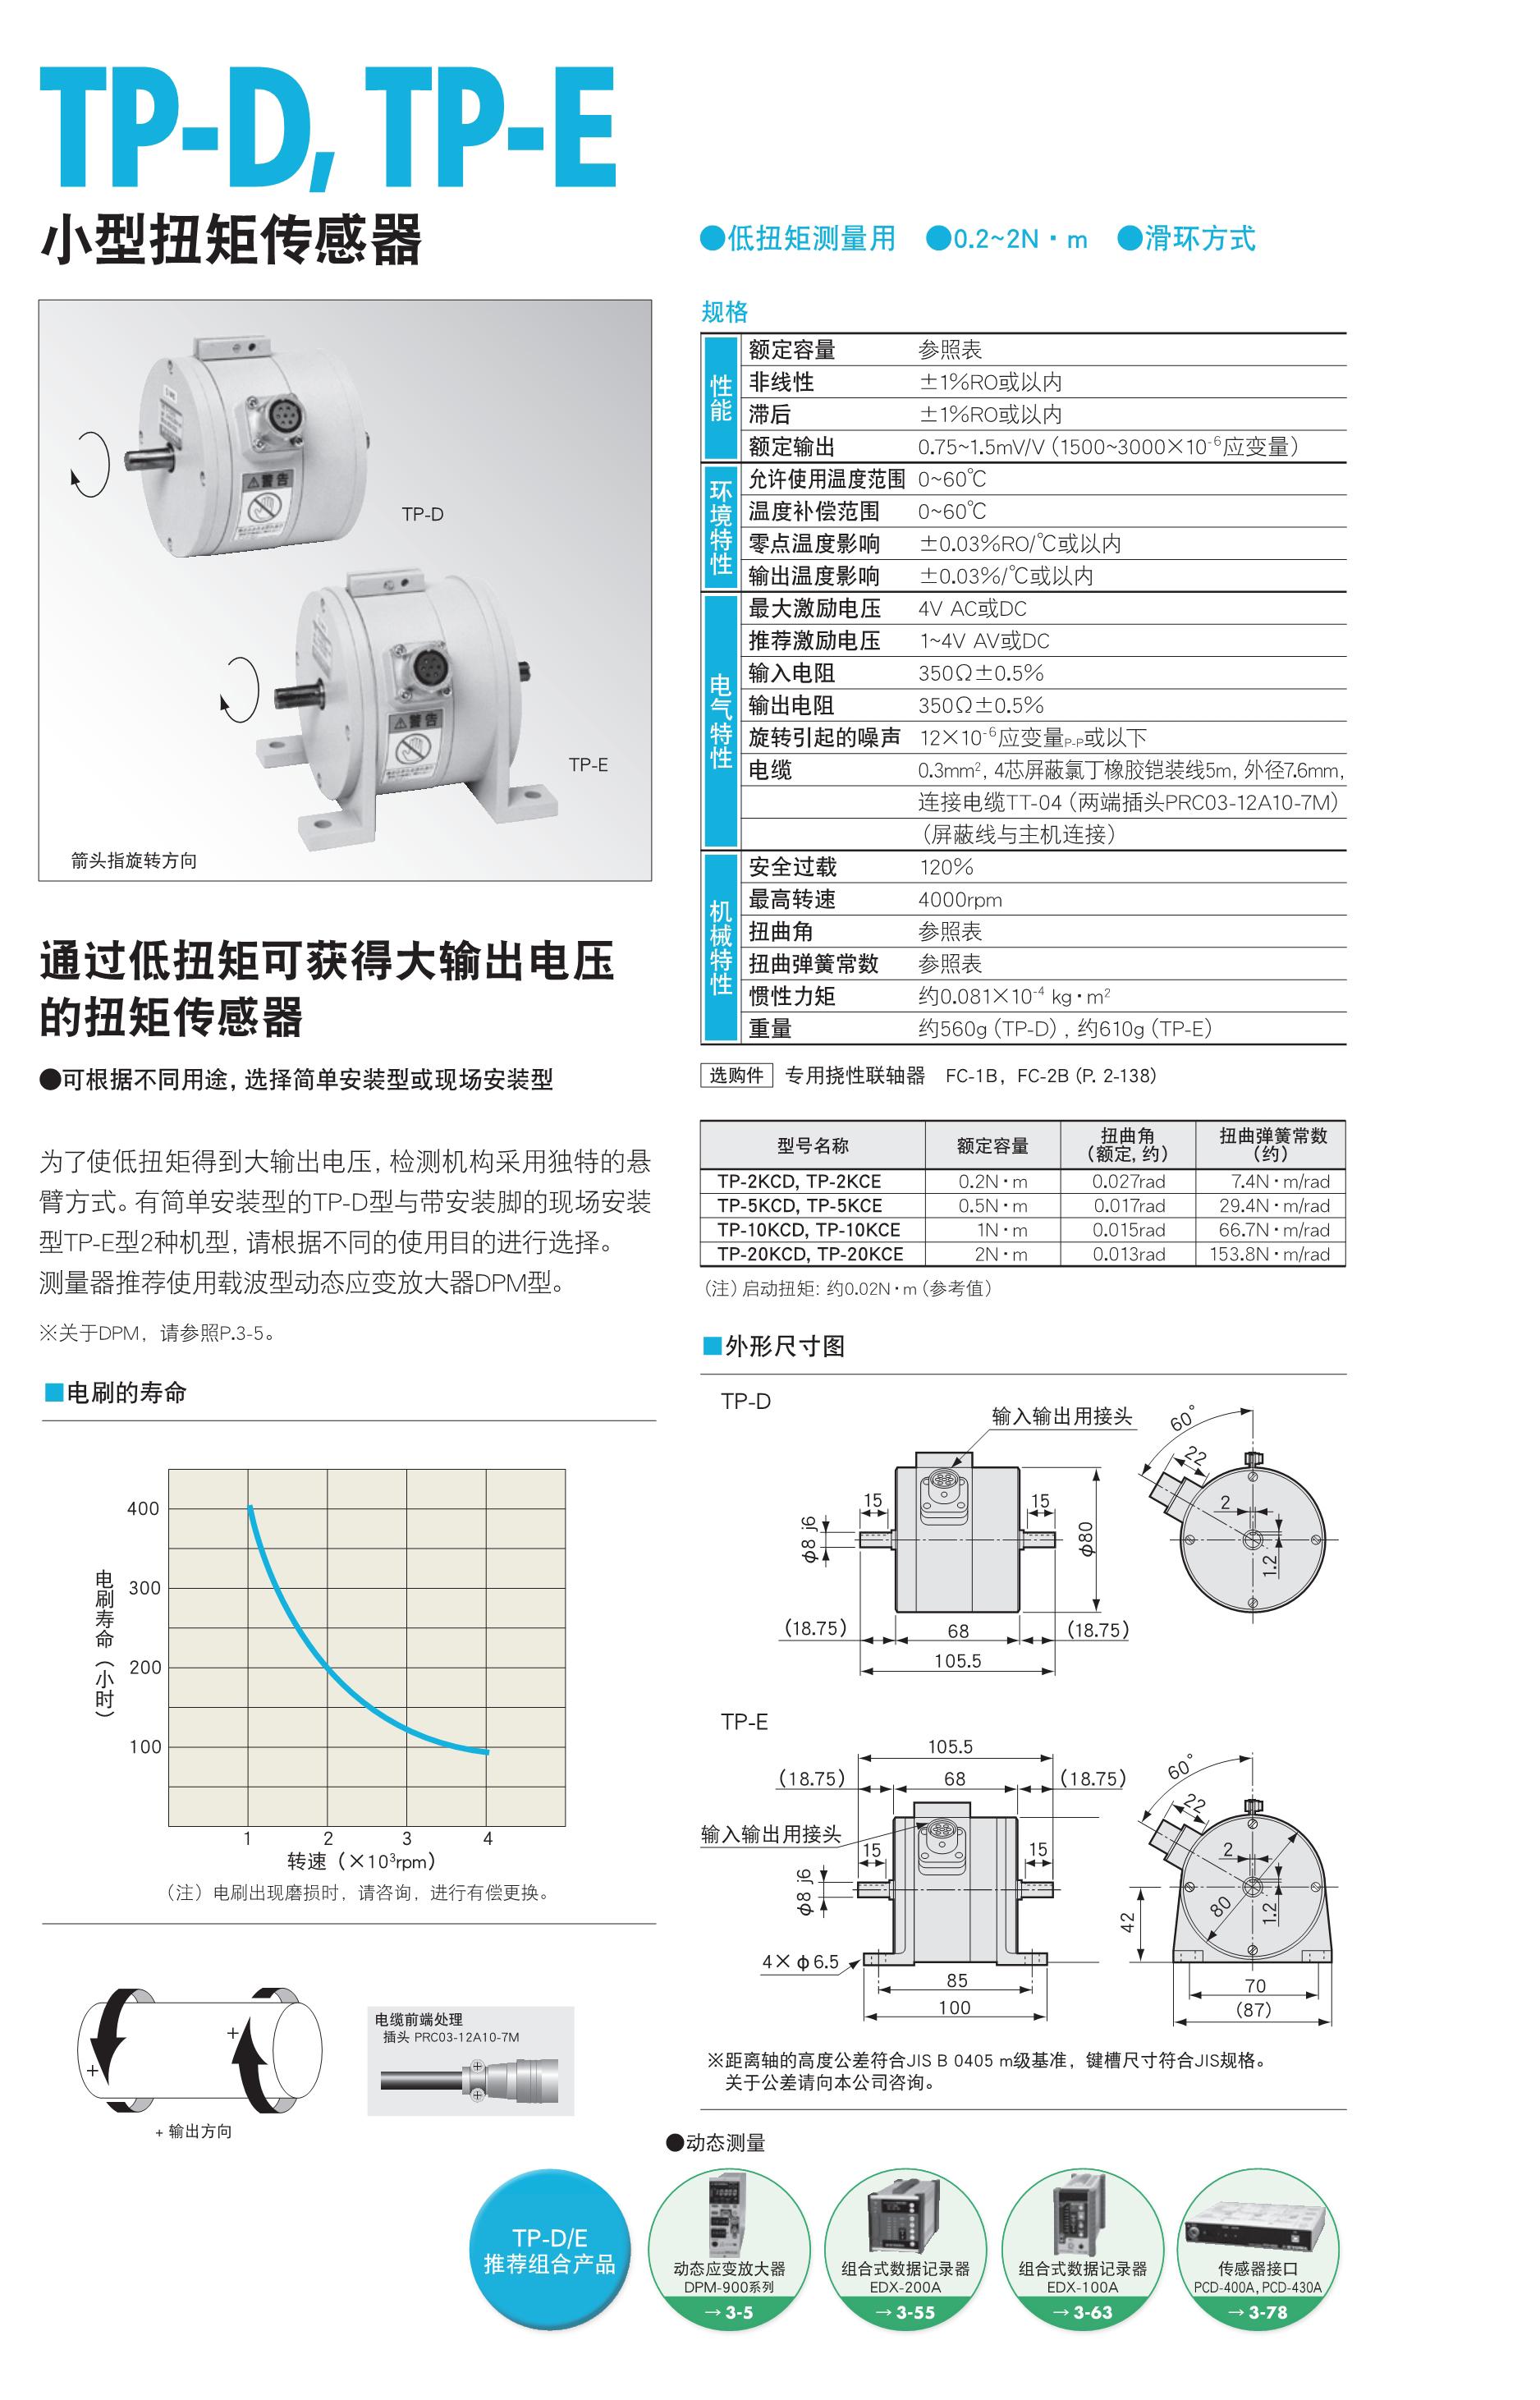 TP-D小型扭矩传感器,TP-E扭矩传感器